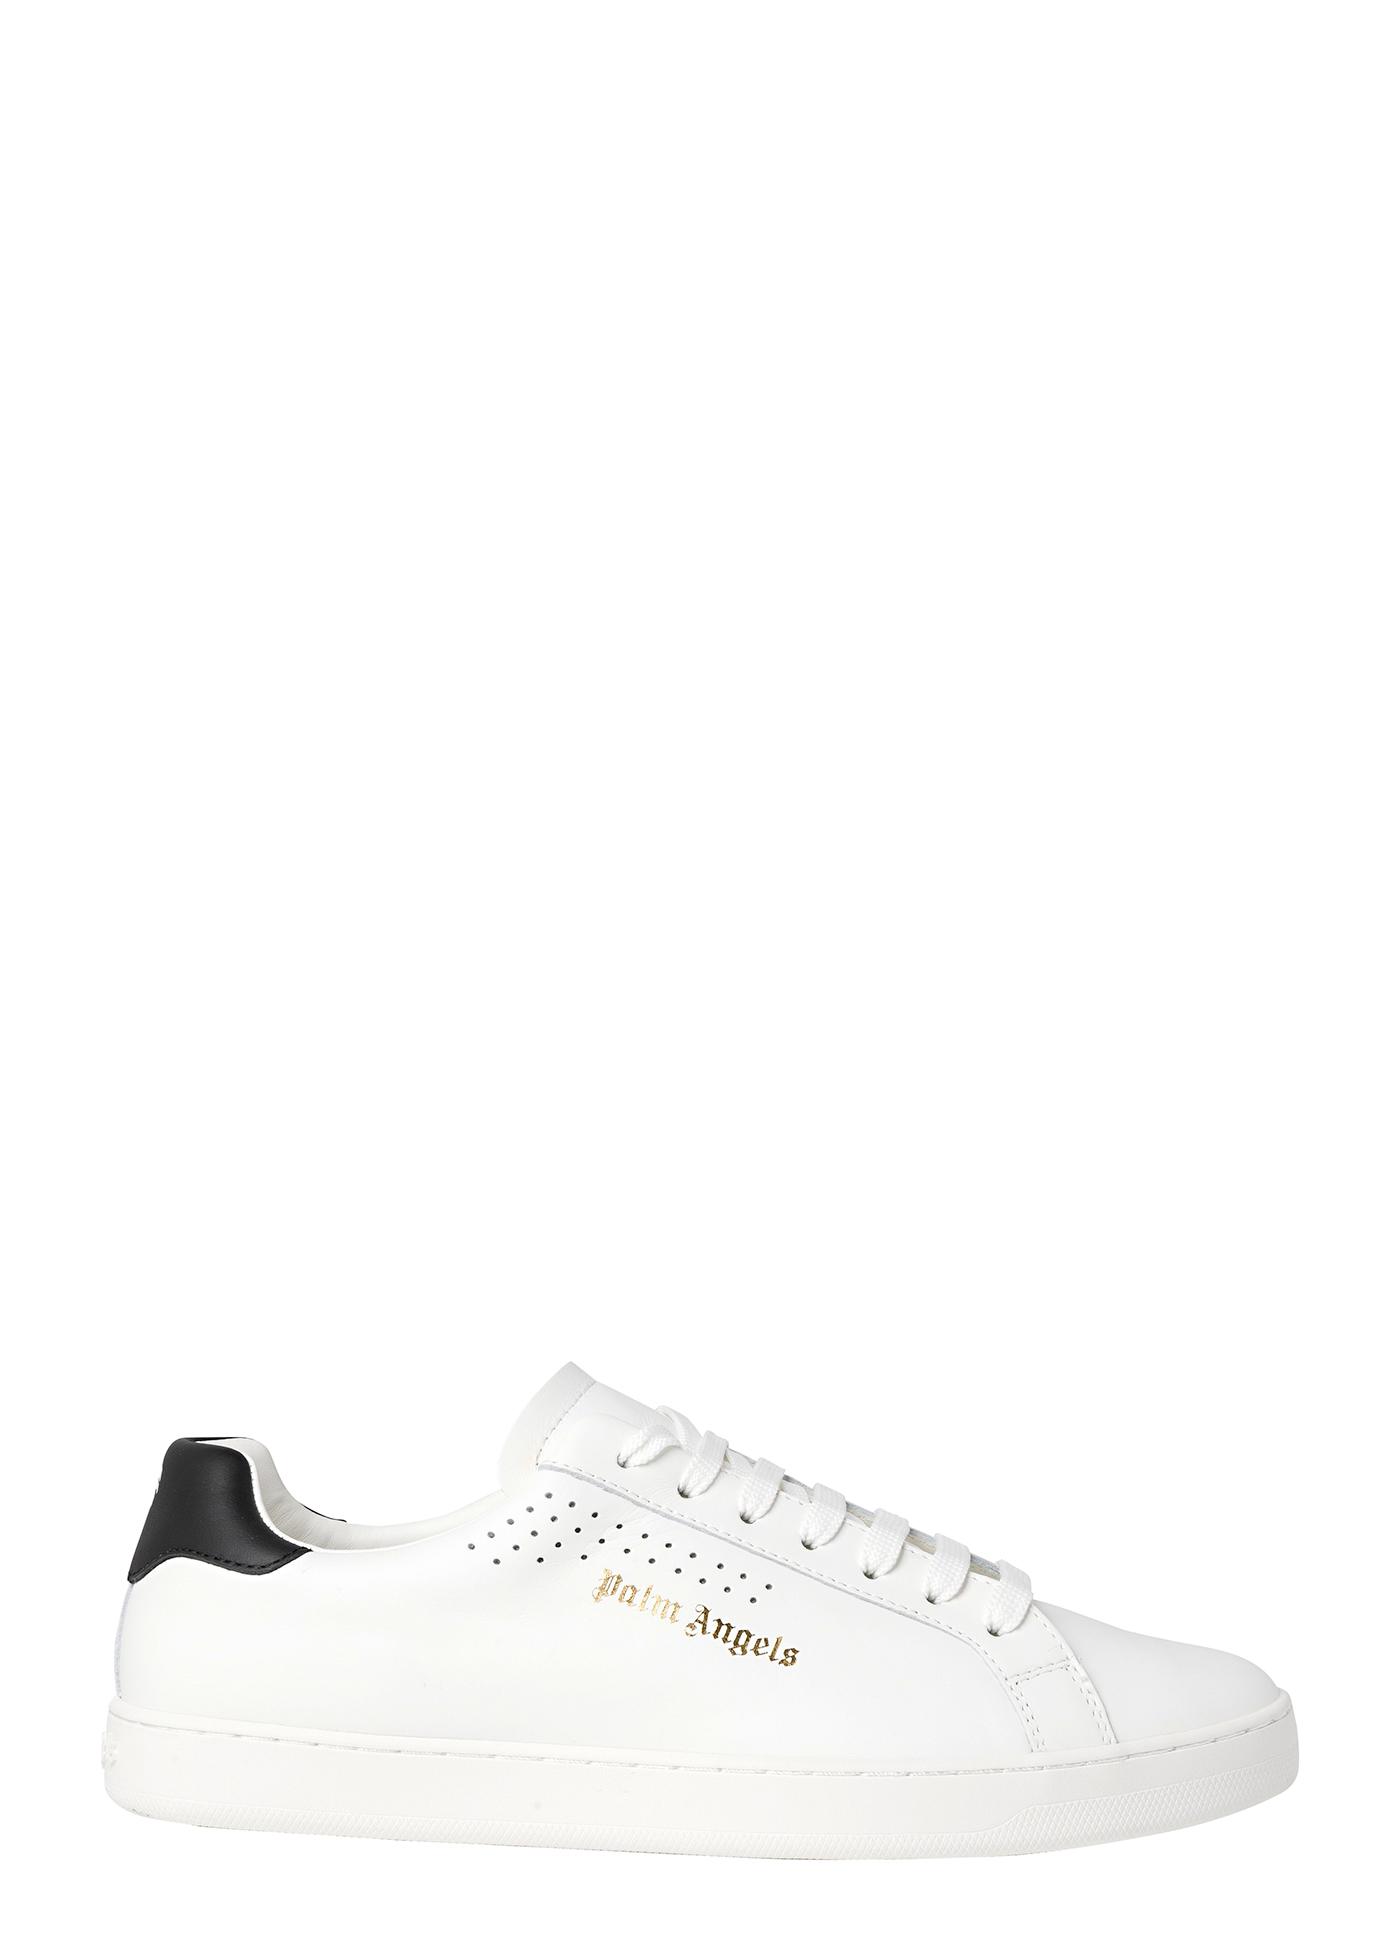 NEW TENNIS SNEAKERS CALF LEA WHITE BLACK image number 0